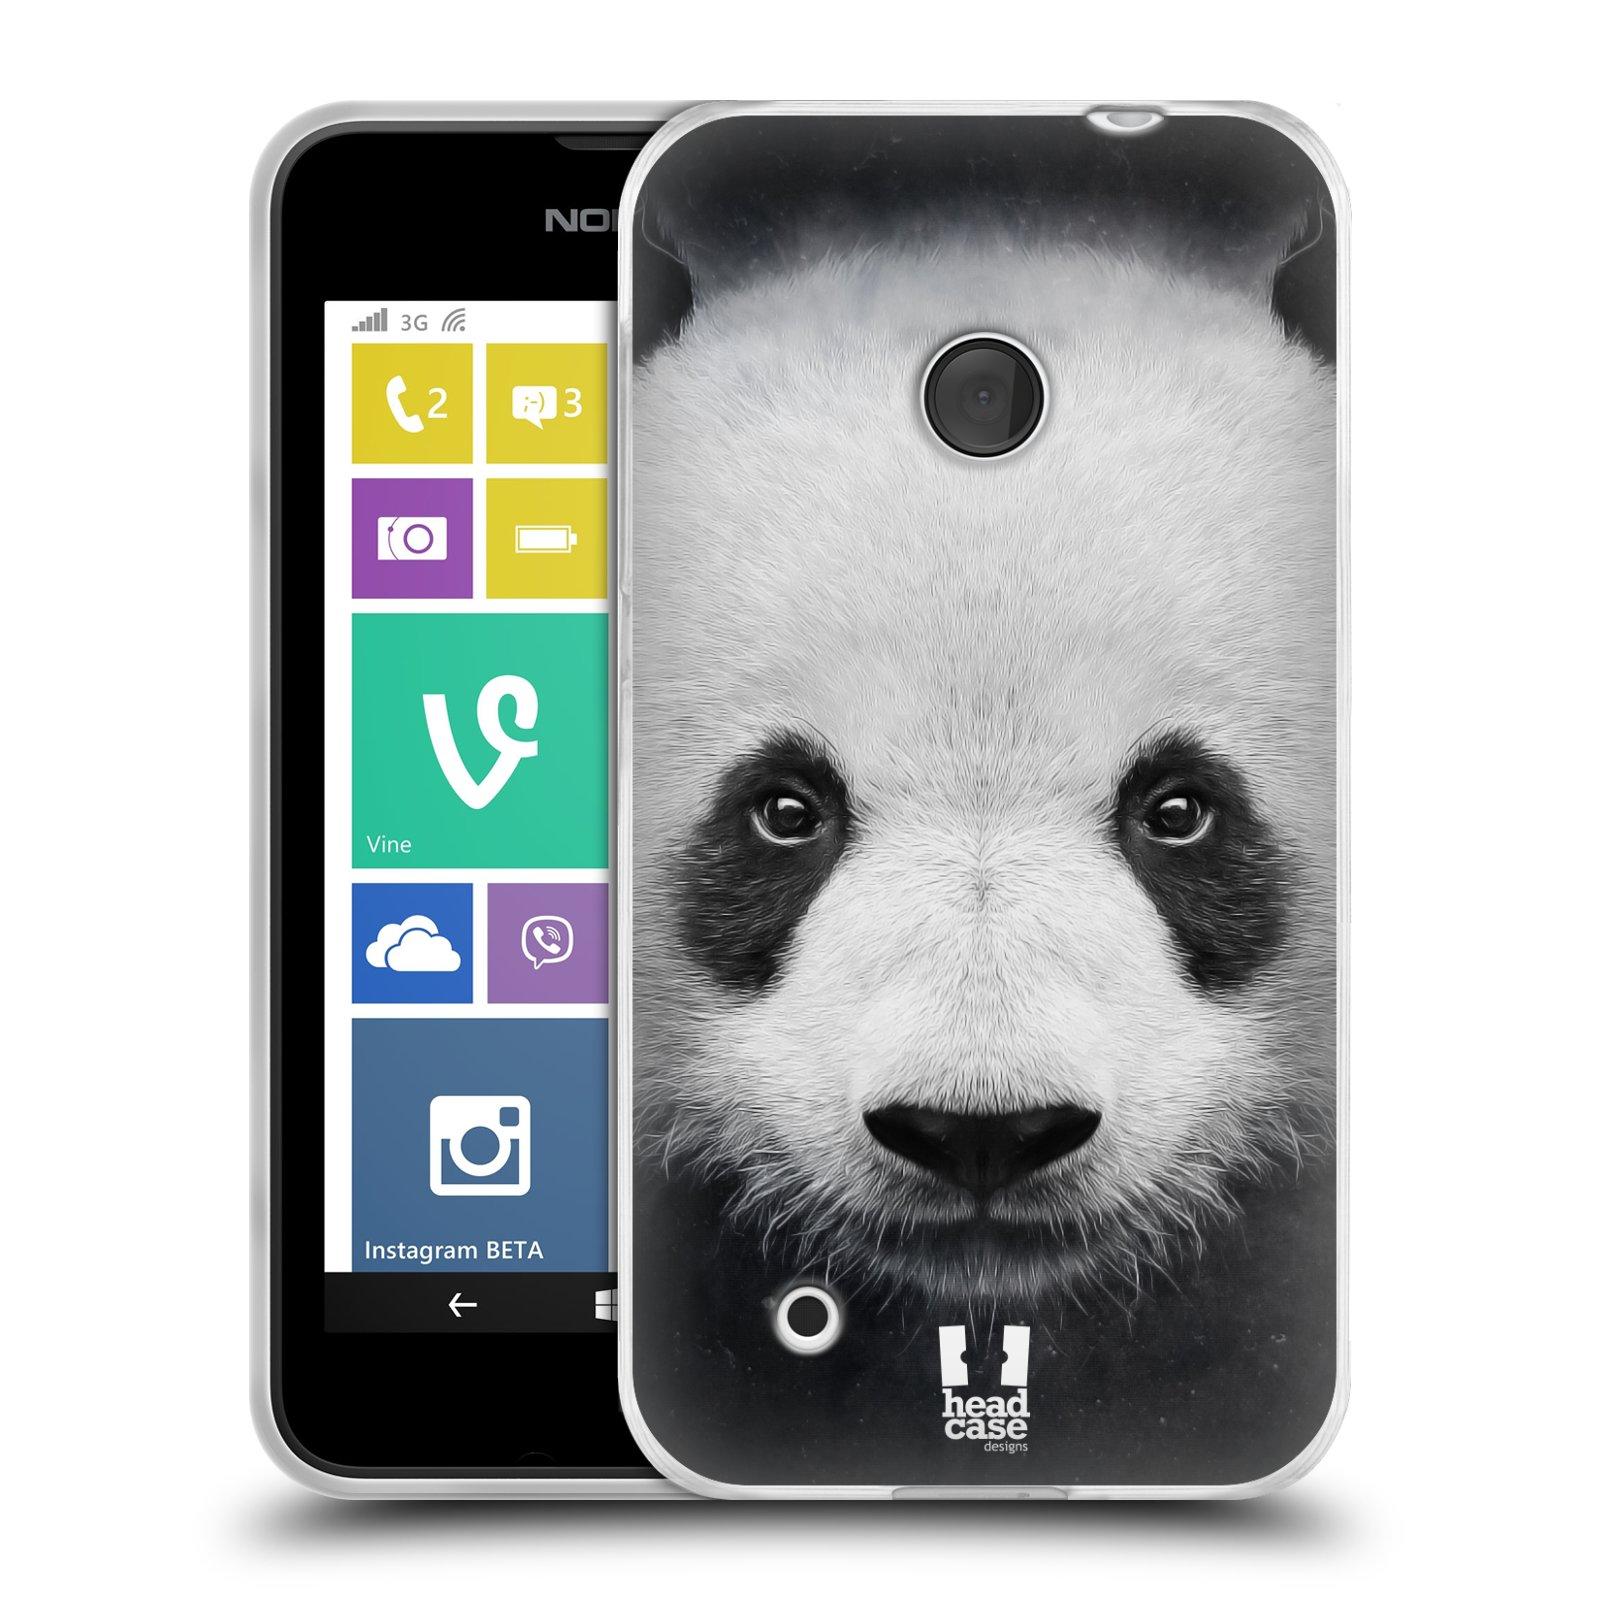 Silikonové pouzdro na mobil Nokia Lumia 530 HEAD CASE TVÁŘ PANDA (Silikonový kryt či obal na mobilní telefon Nokia Lumia 530)